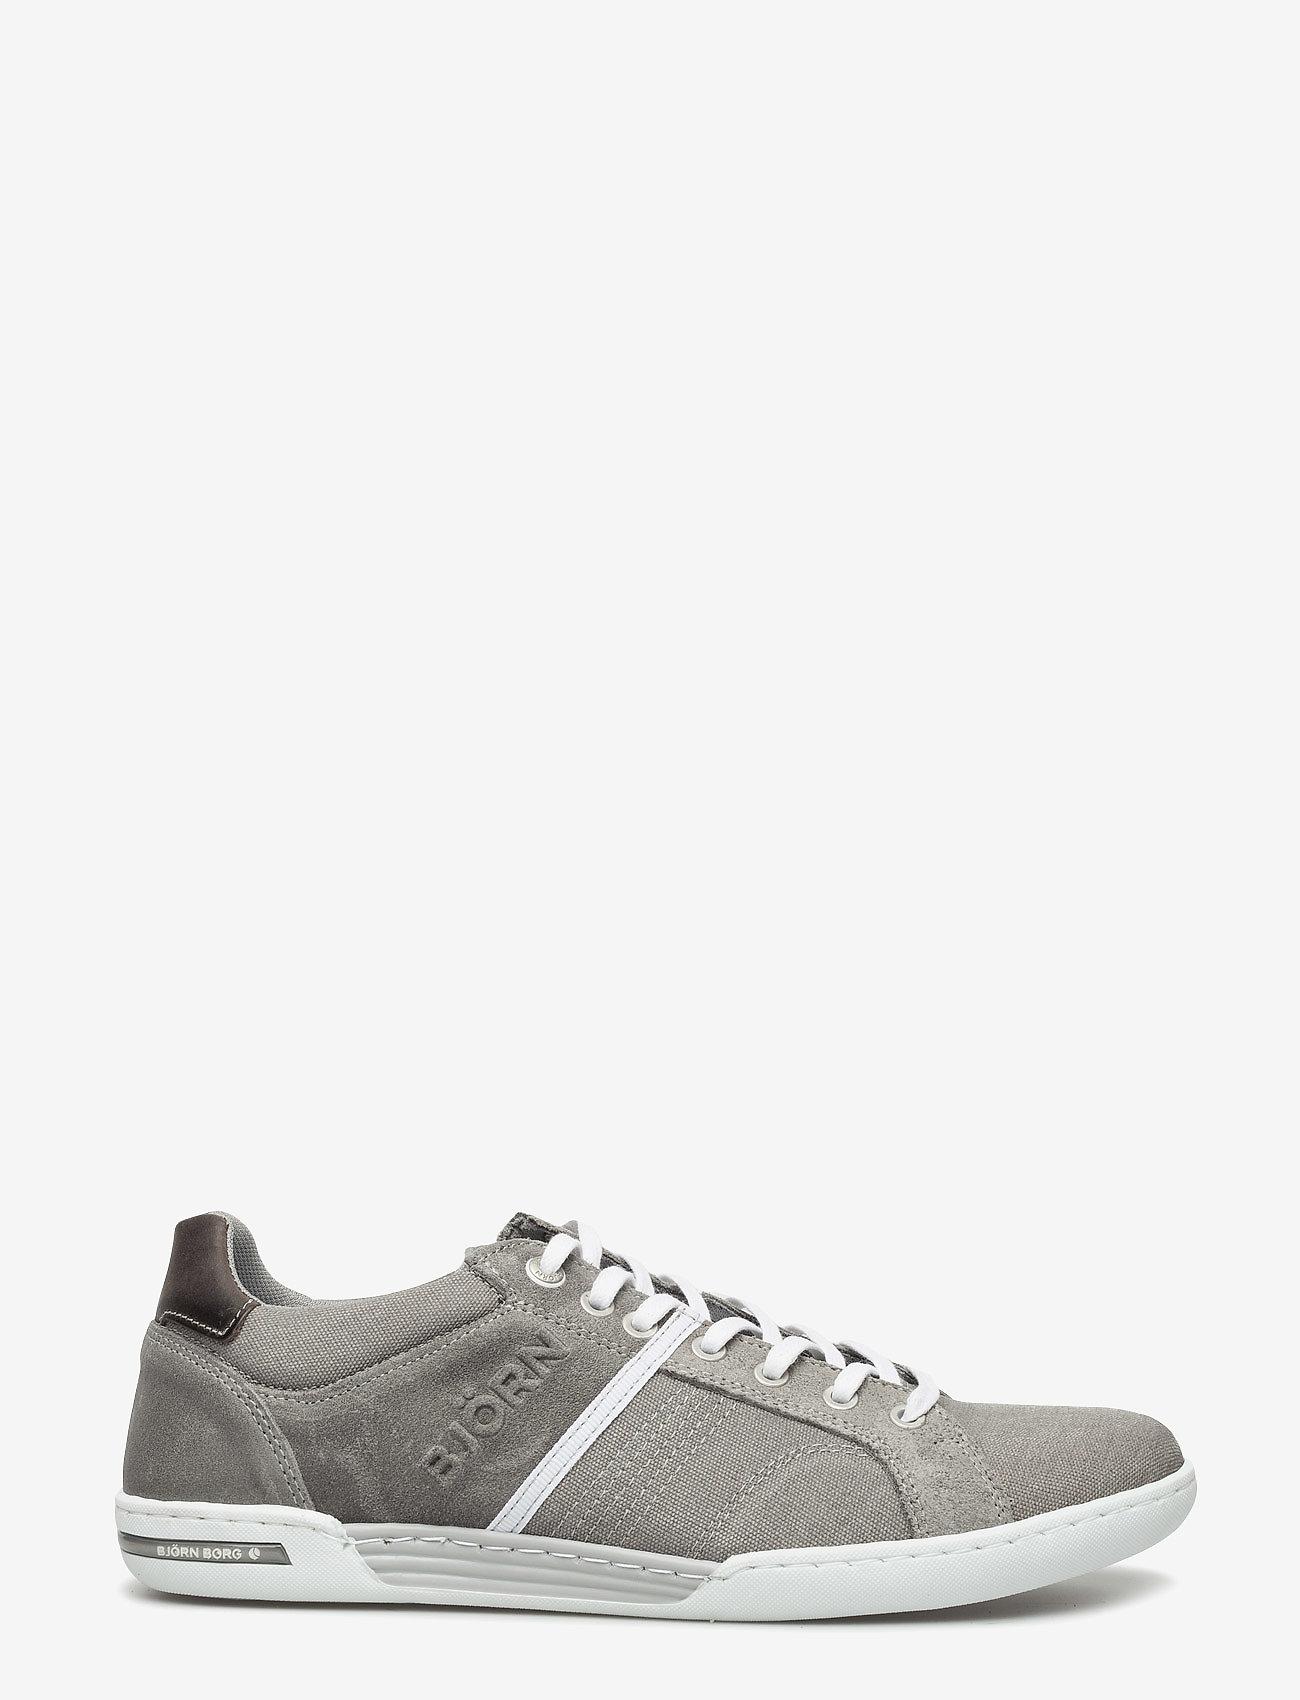 Björn Borg - Coltrane Cvs - laag sneakers - lt grey-dk grey - 1